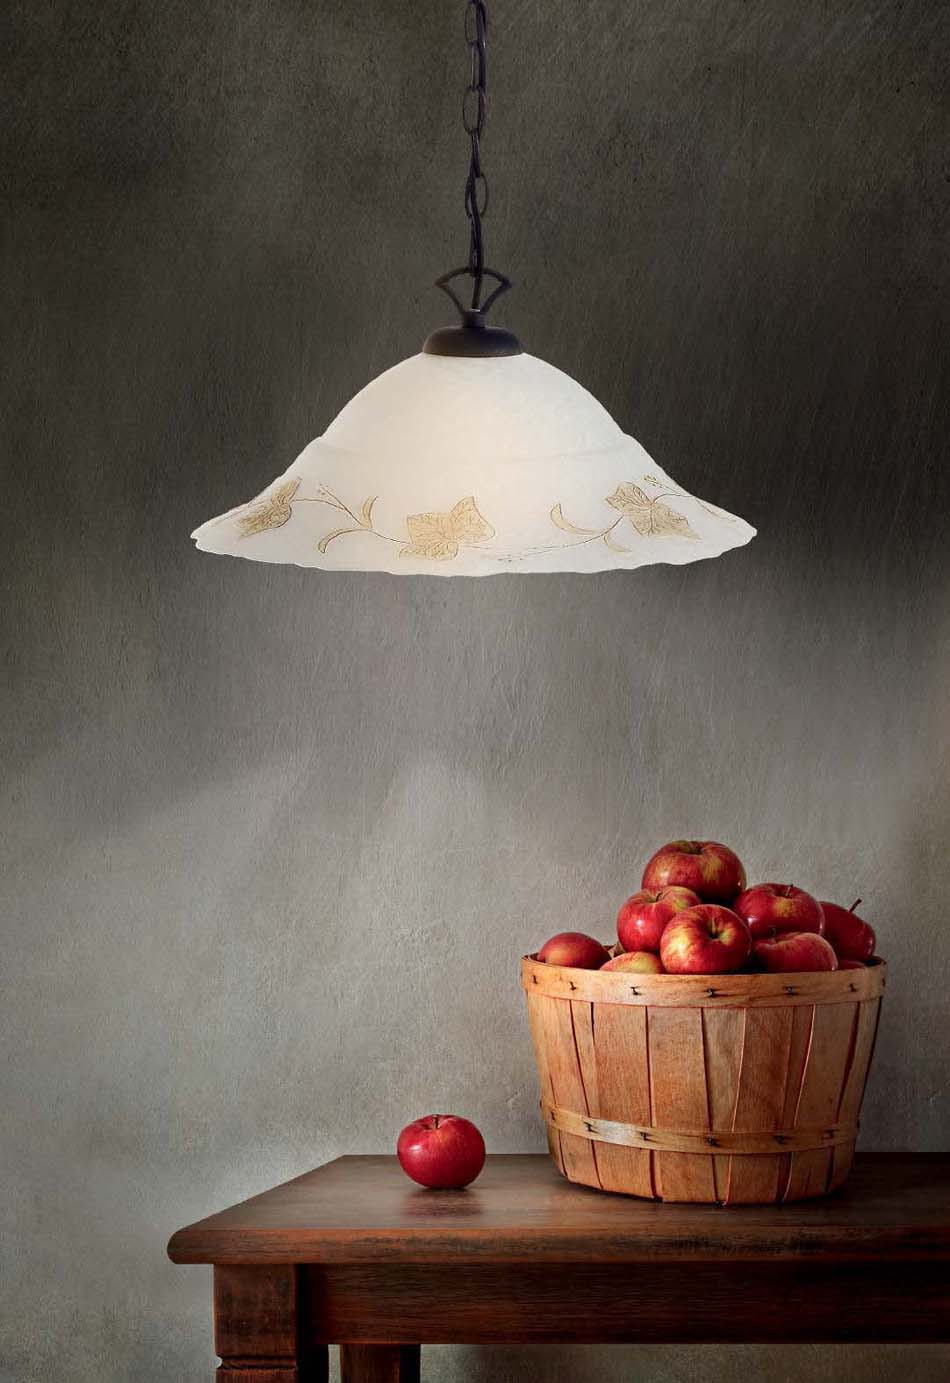 Lampade 52 sospensione Classico Ideal Lux Foglia – Bruni Arredamenti